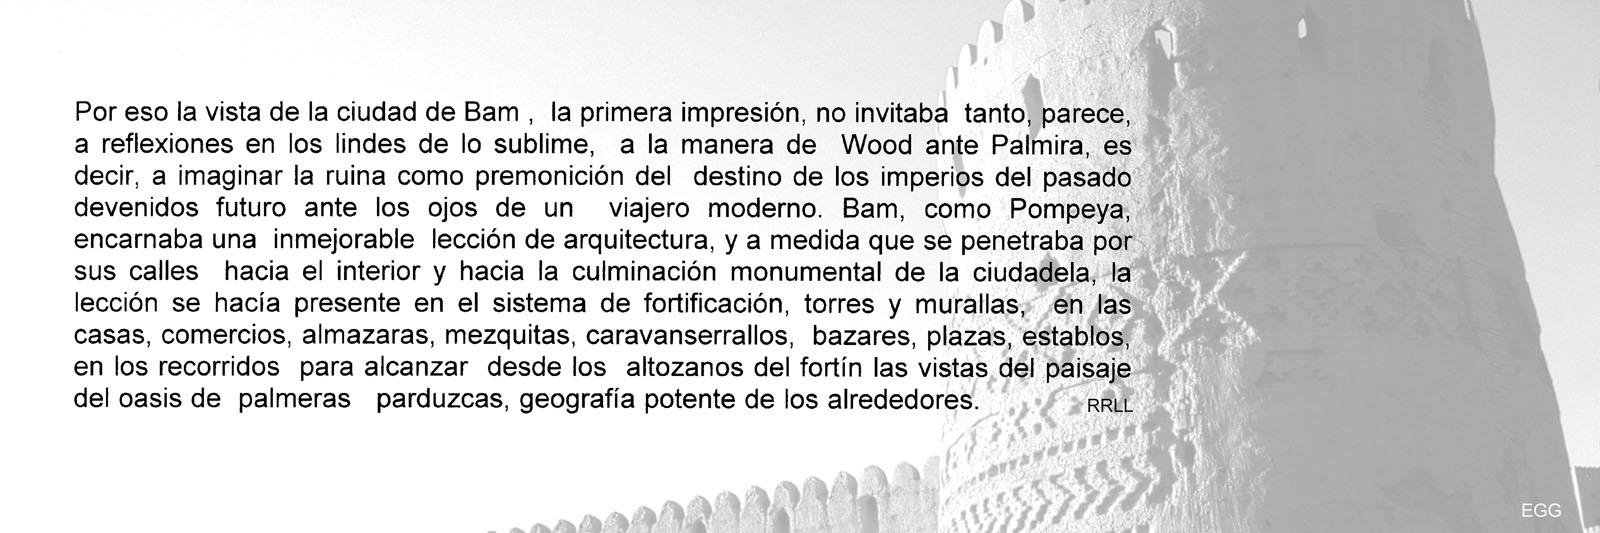 danielvillalobos-architecturalexhibition-bam-architectureofmud-72